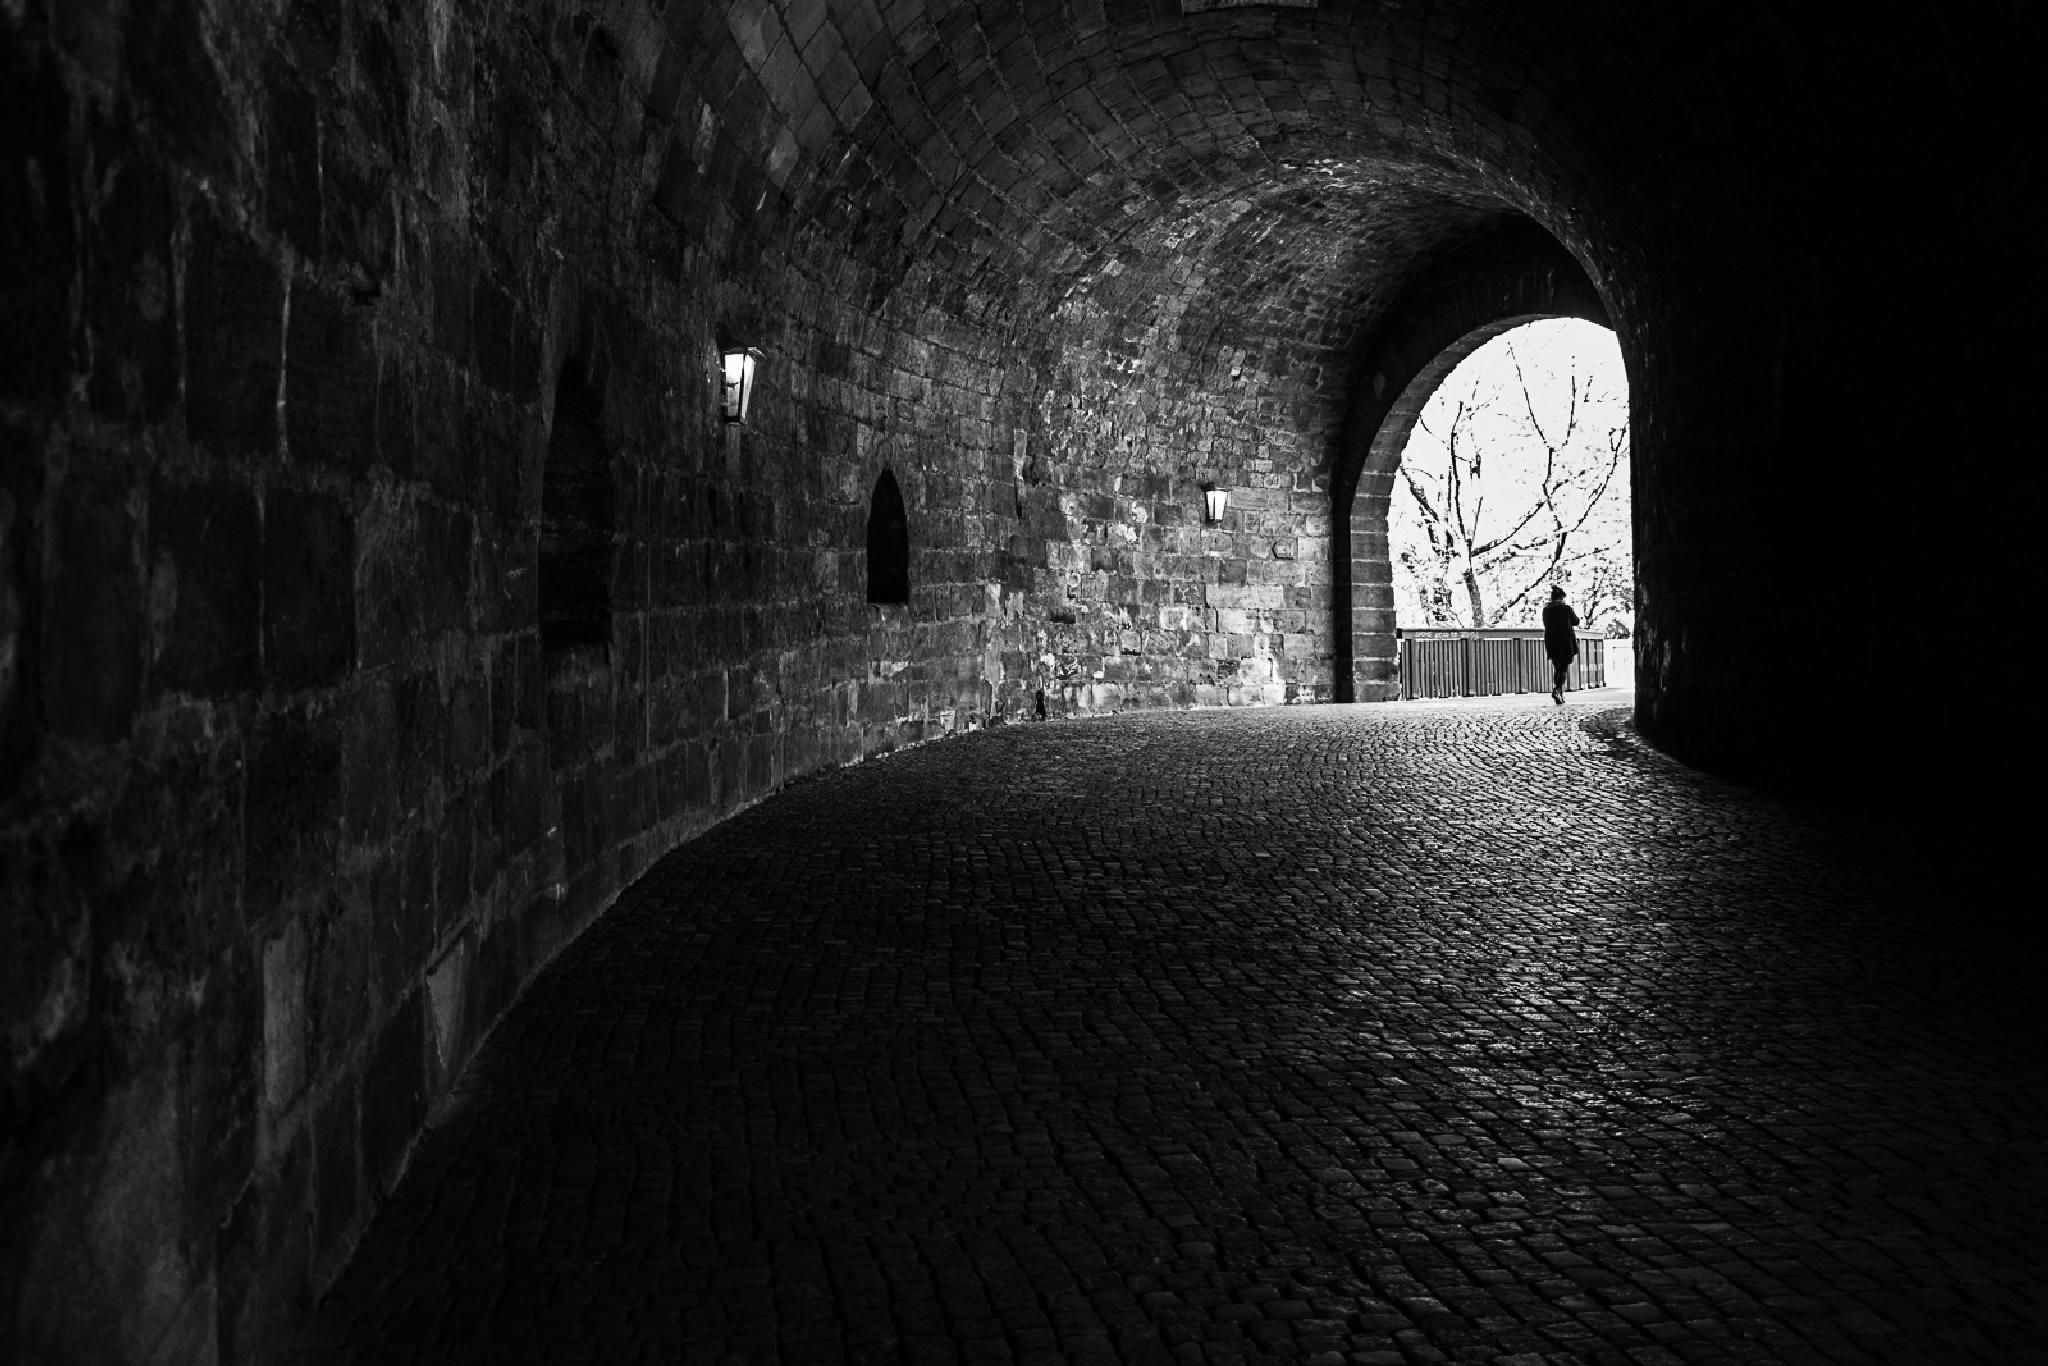 Towards The Light by vitali